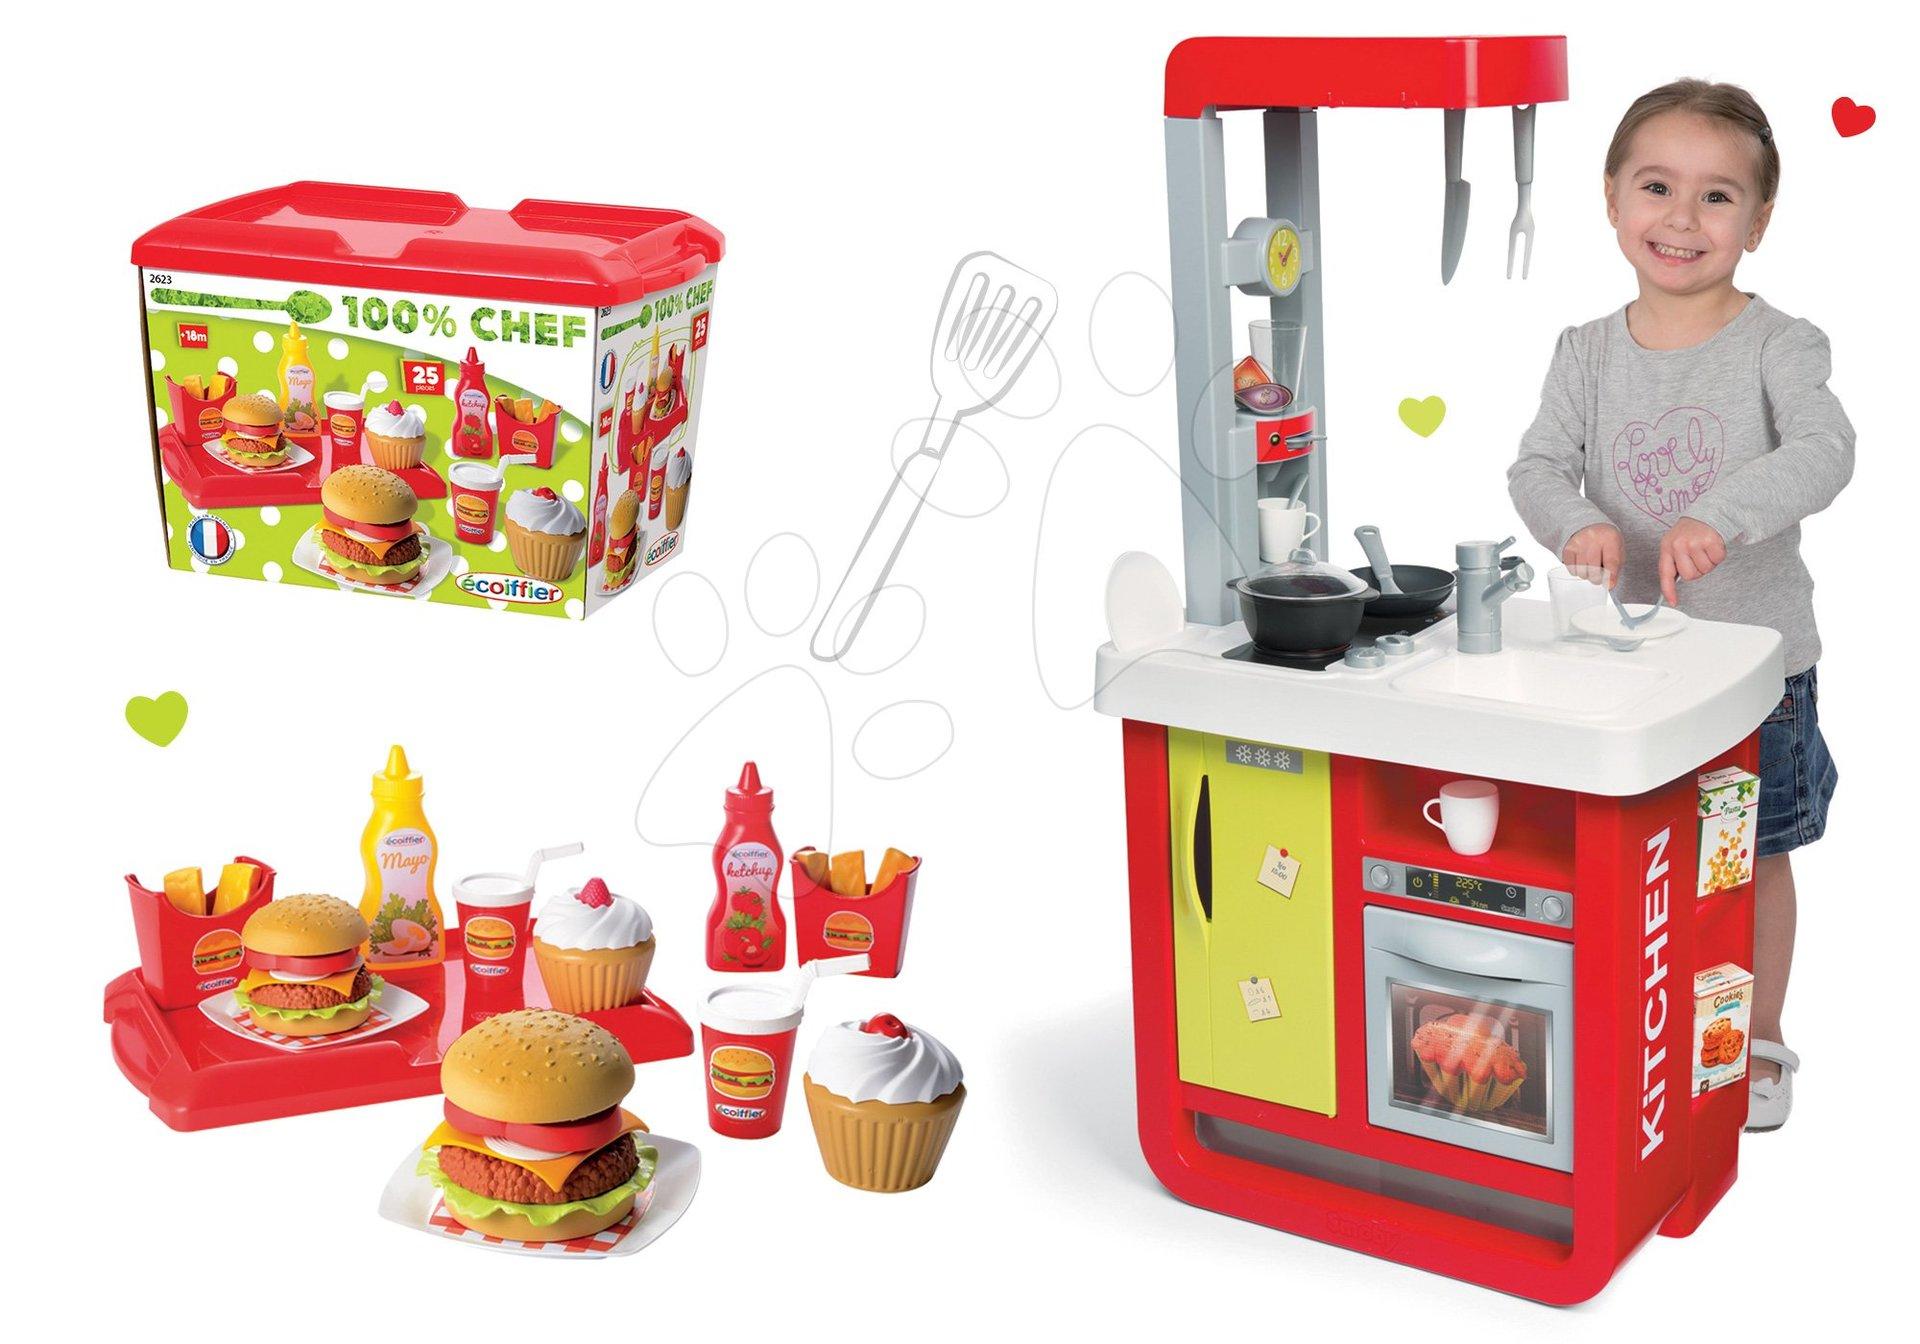 Smoby detská kuchynka Cherry Special a Écoiffier hamburgery 100% Chef 310810-7